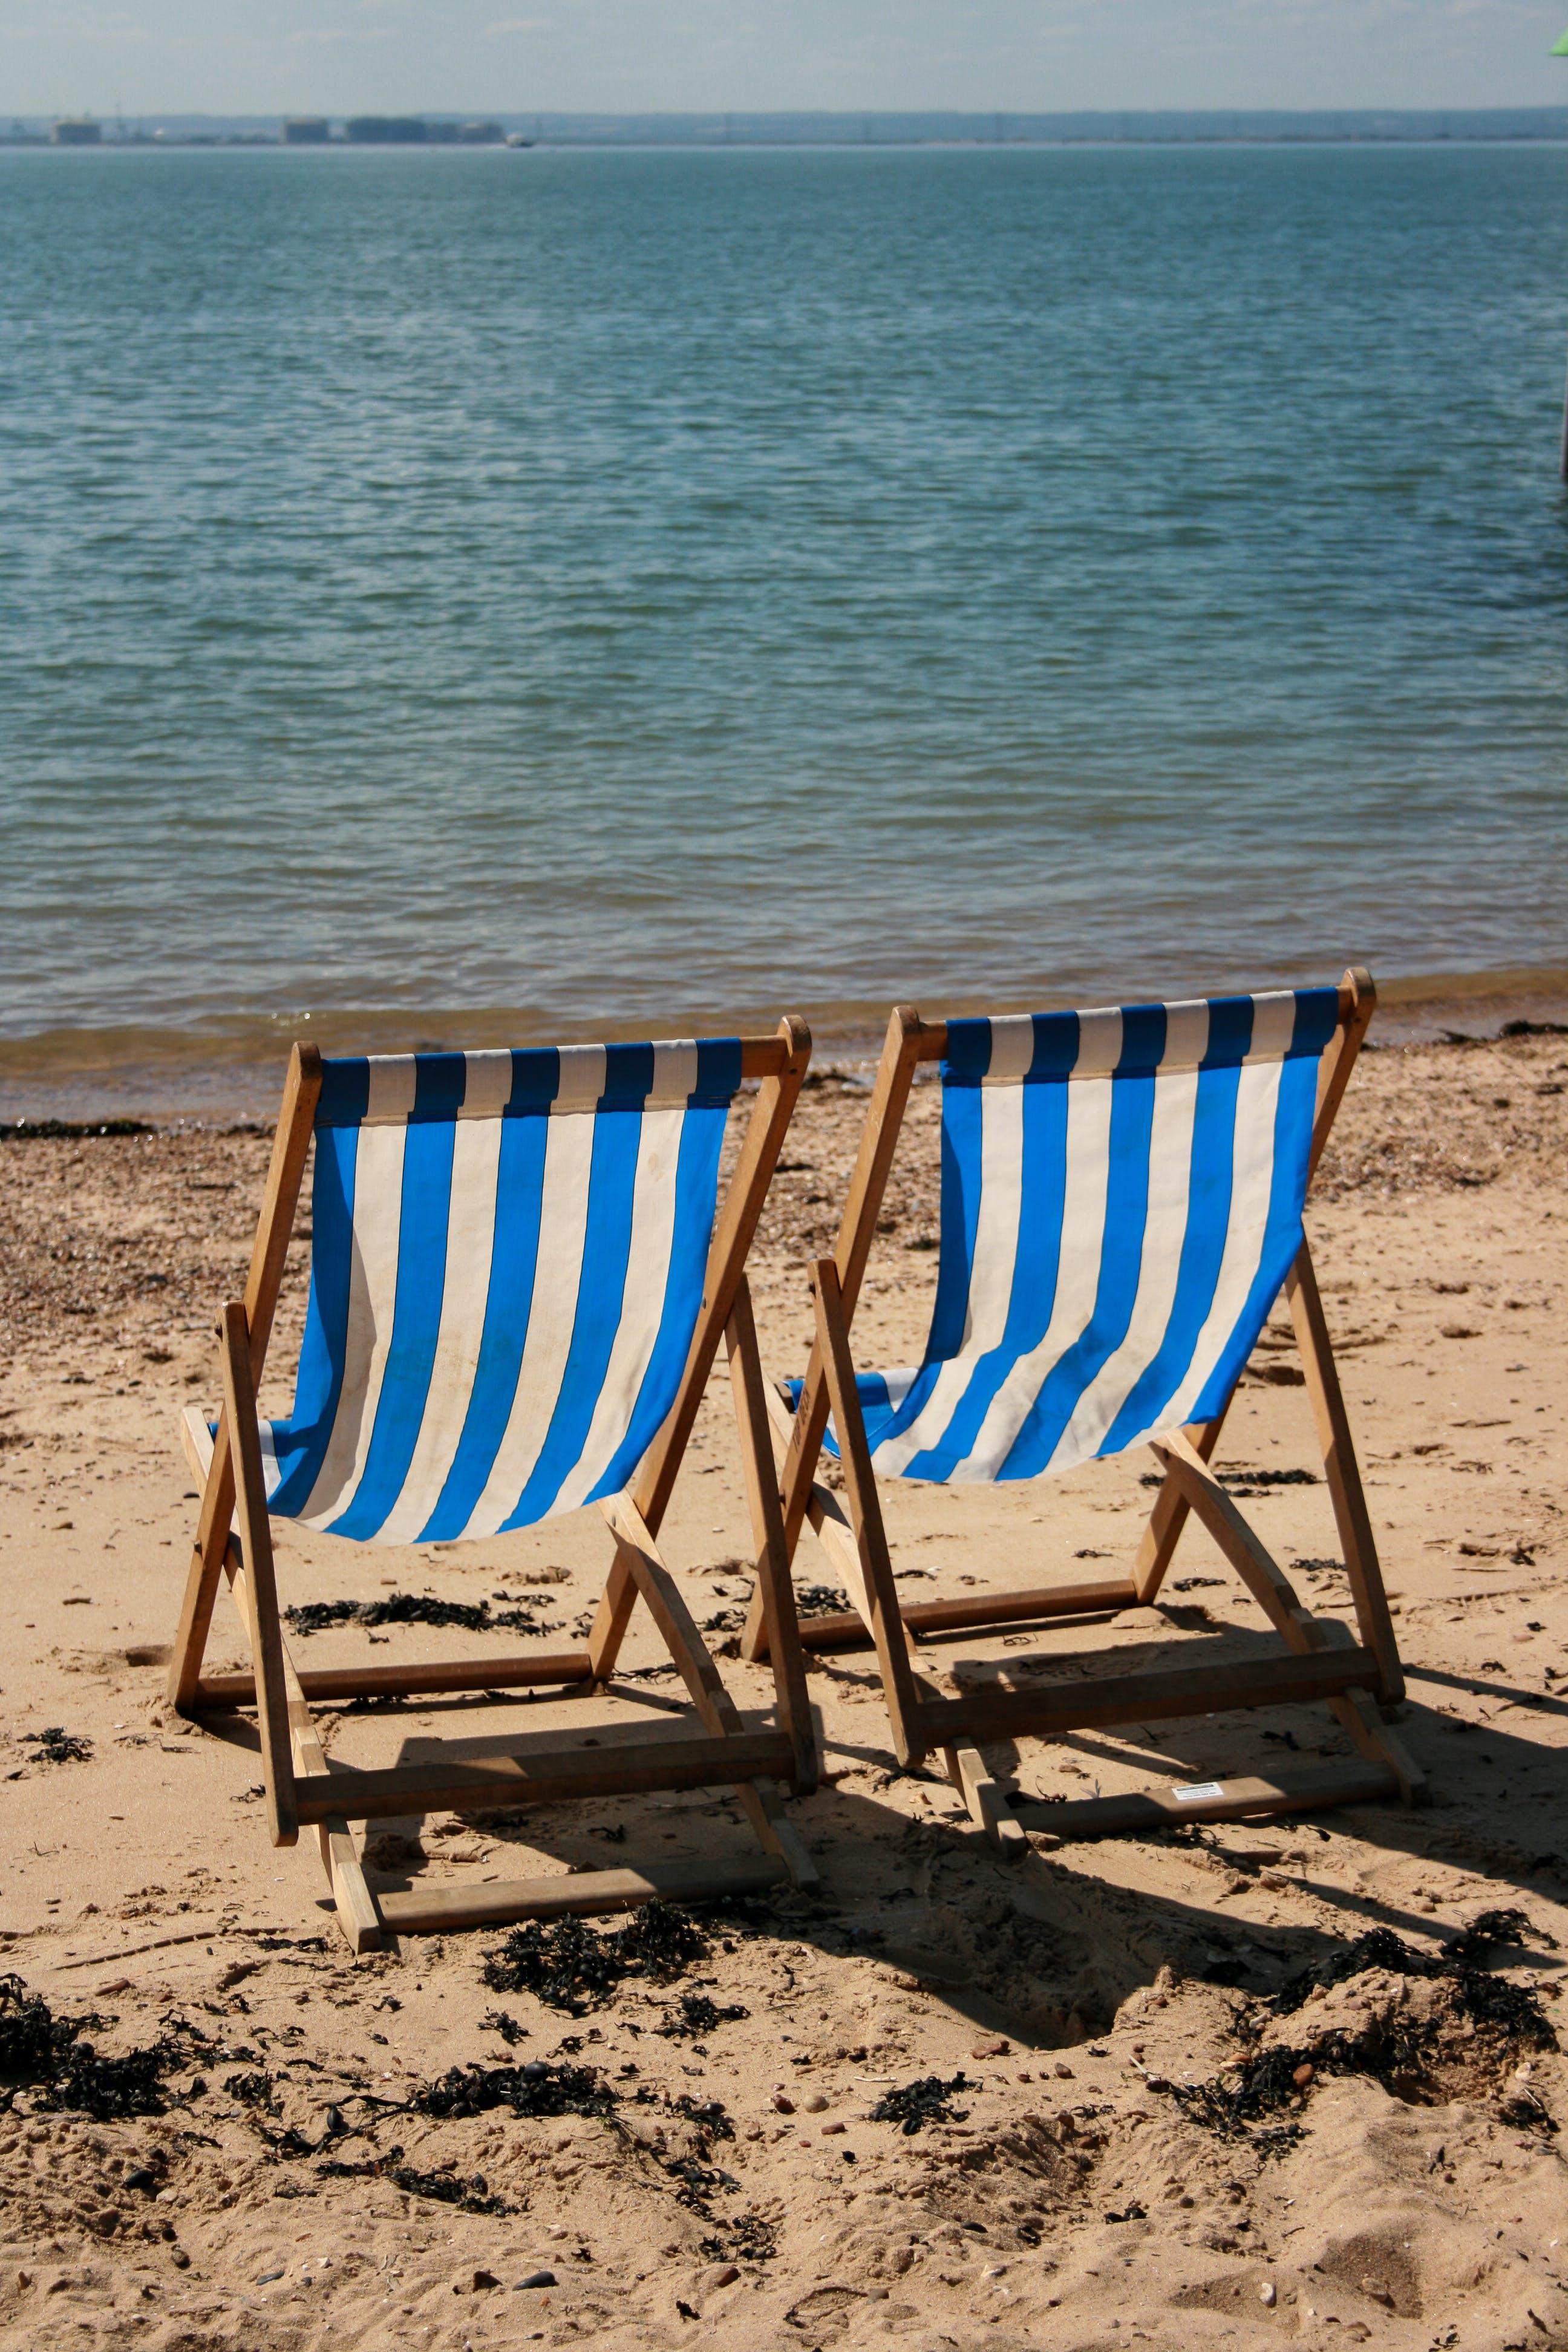 Free stock photo of sea, beach, sand, seaweed